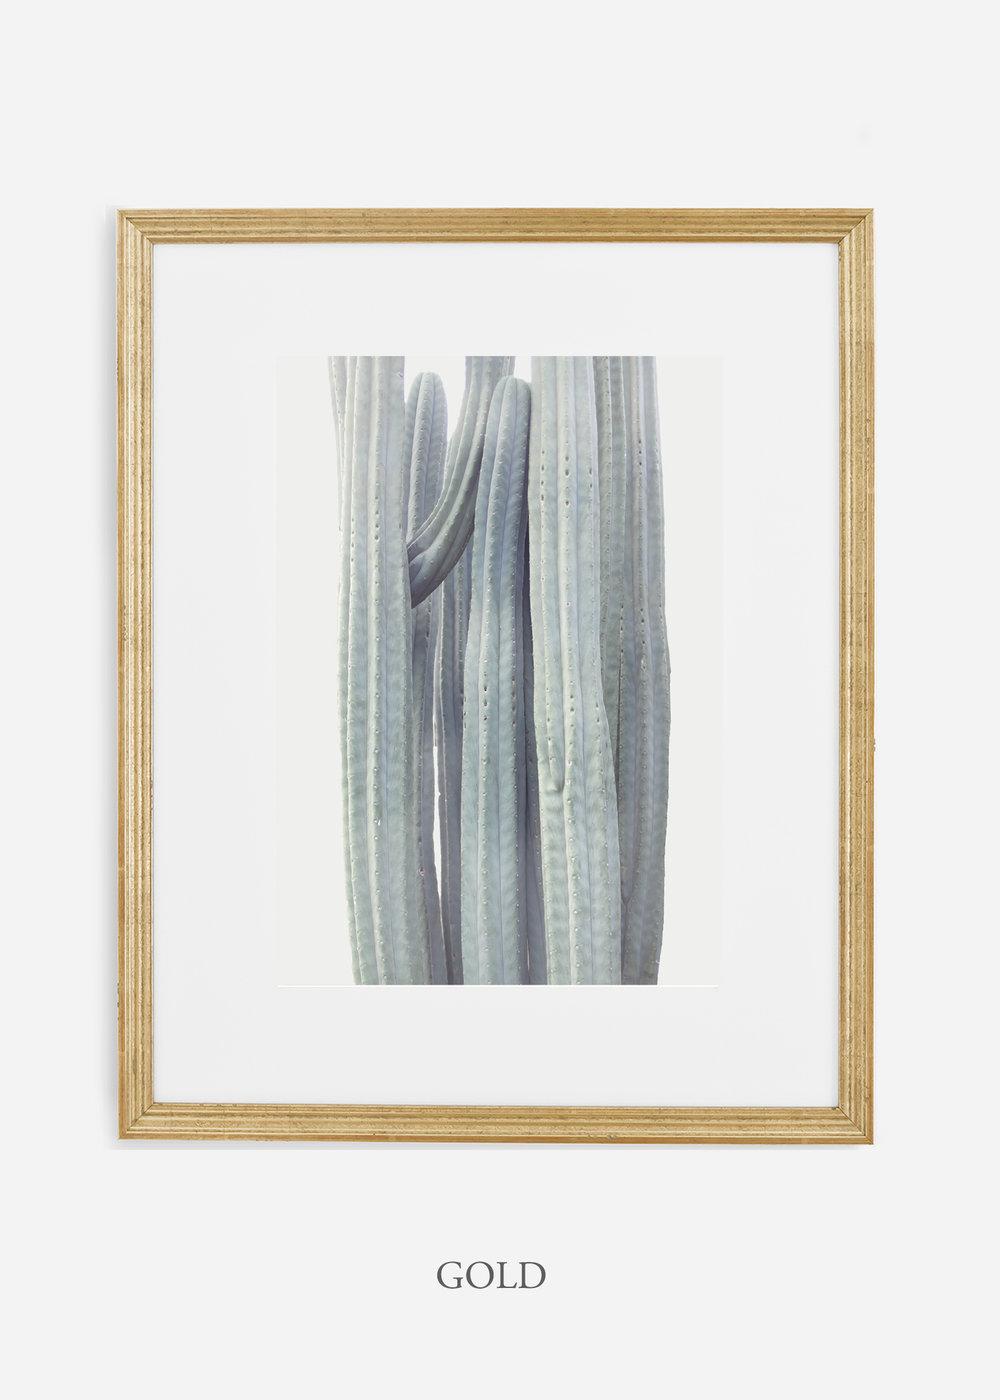 wildercalifornia_winterwhite_goldframe_interiordesign_white_neutral_cactus_art_photography_large.jpg